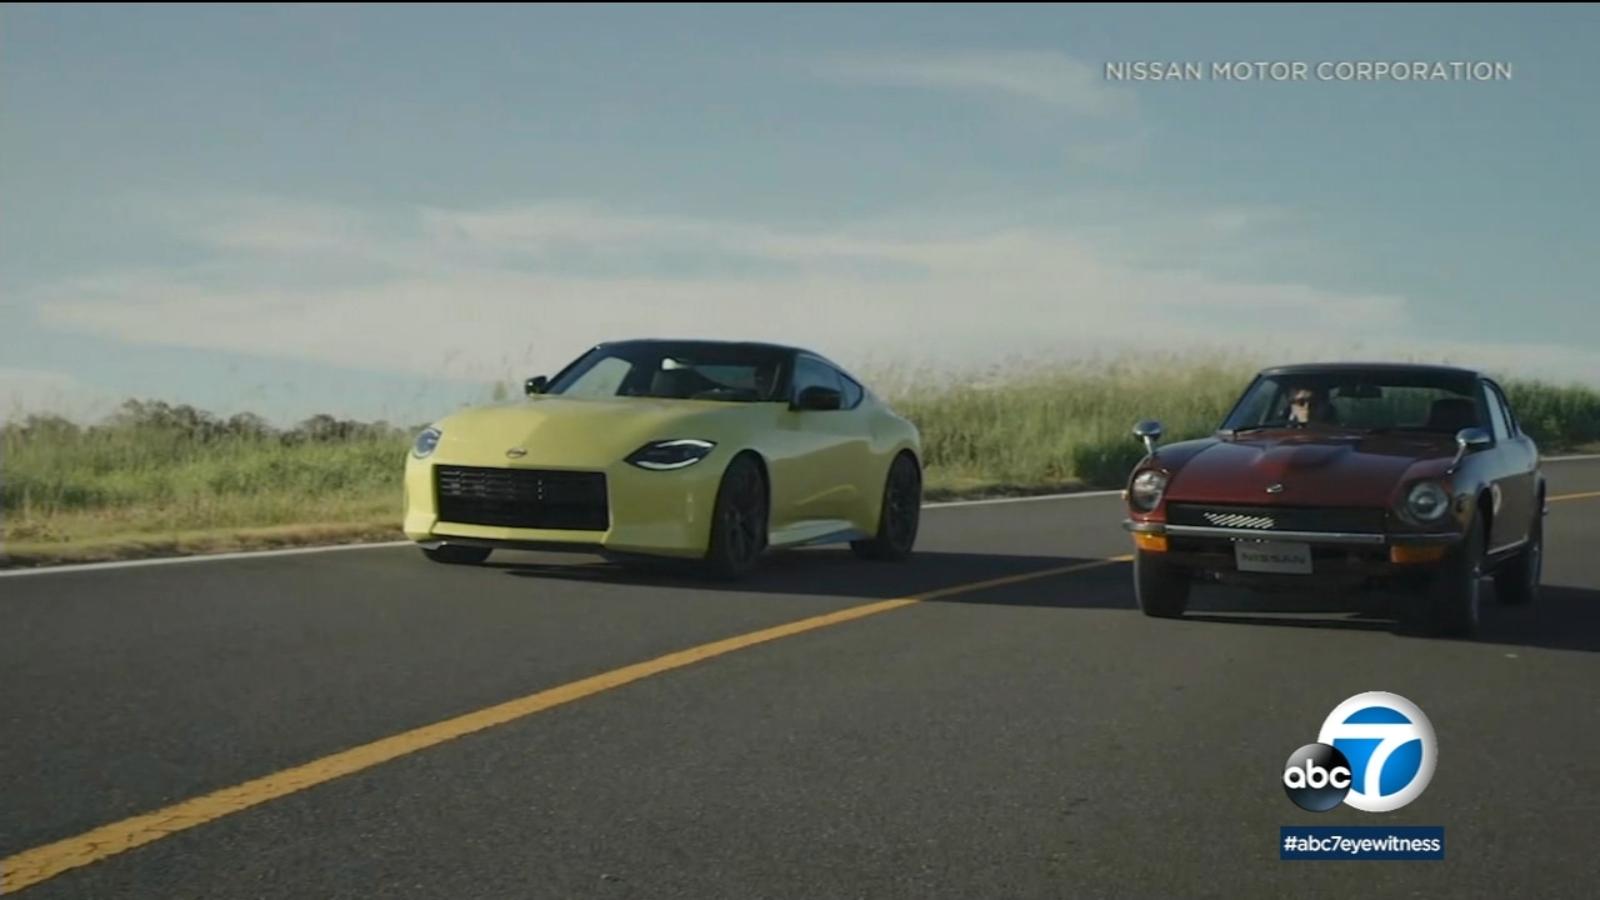 New Nissan Z sports car pays tribute to original Datsun 240Z -TV thumbnail